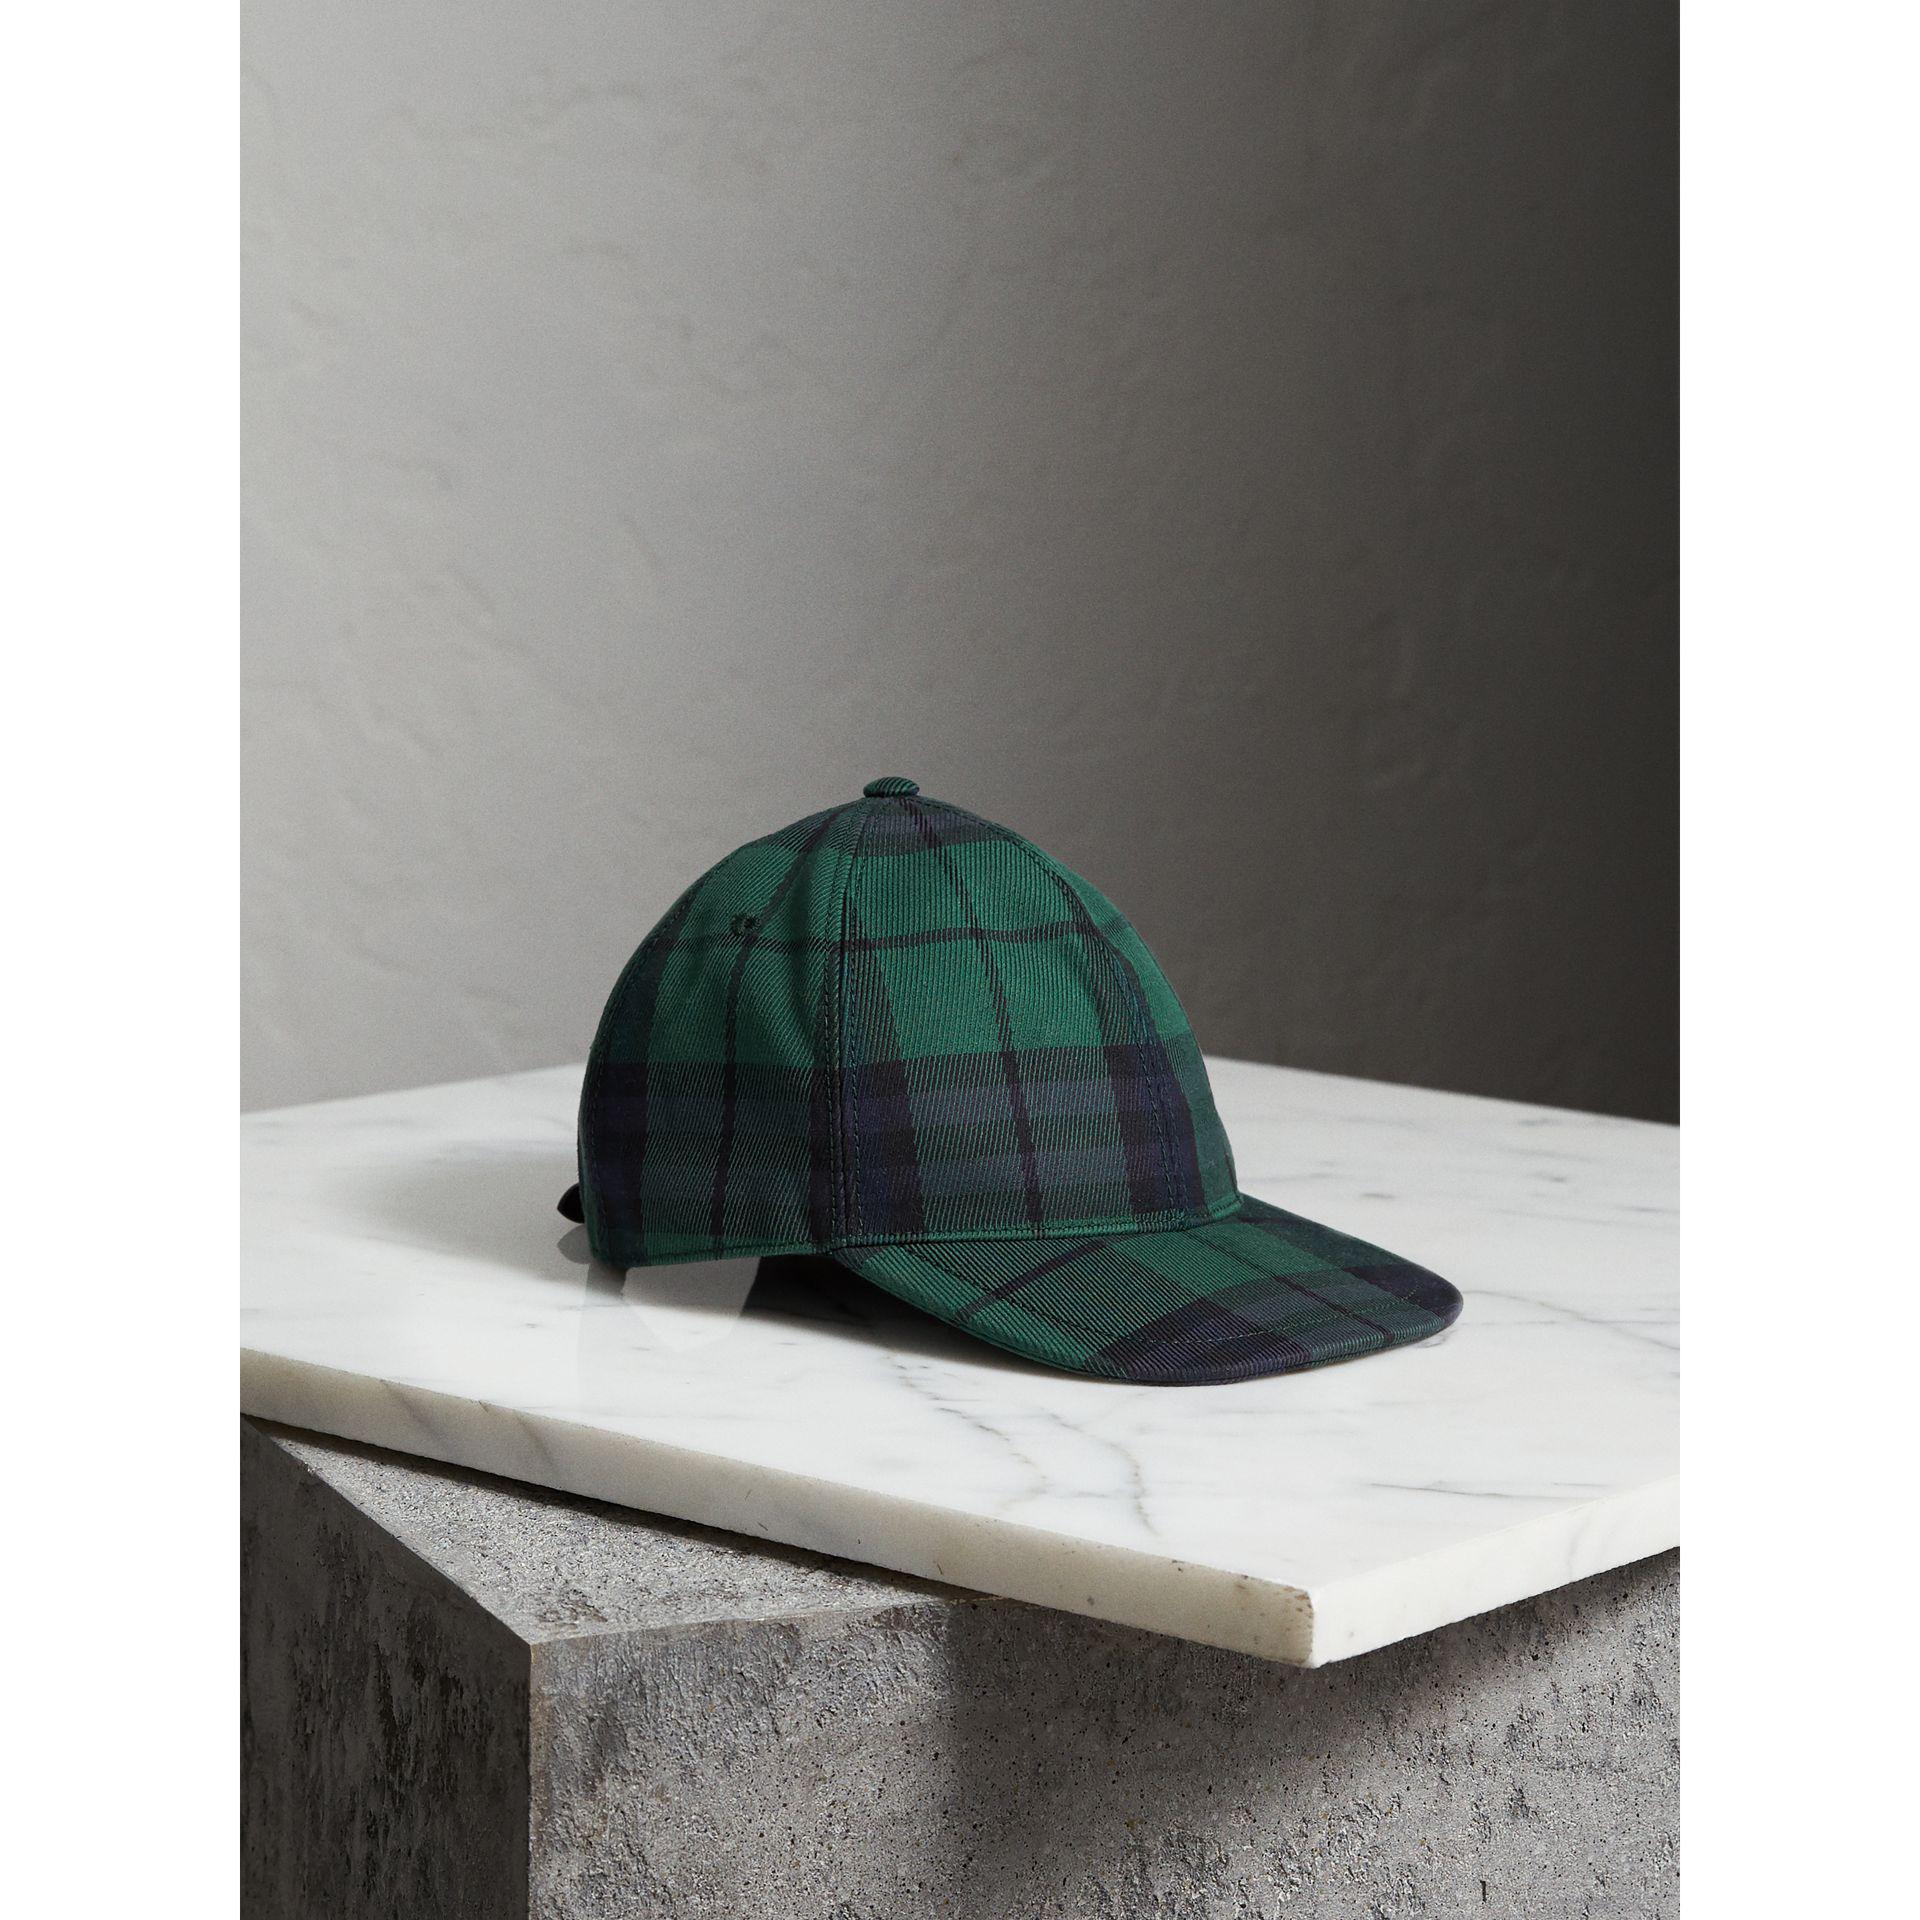 Lyst - Burberry Tartan Baseball Cap in Green for Men 5a8c197c959e